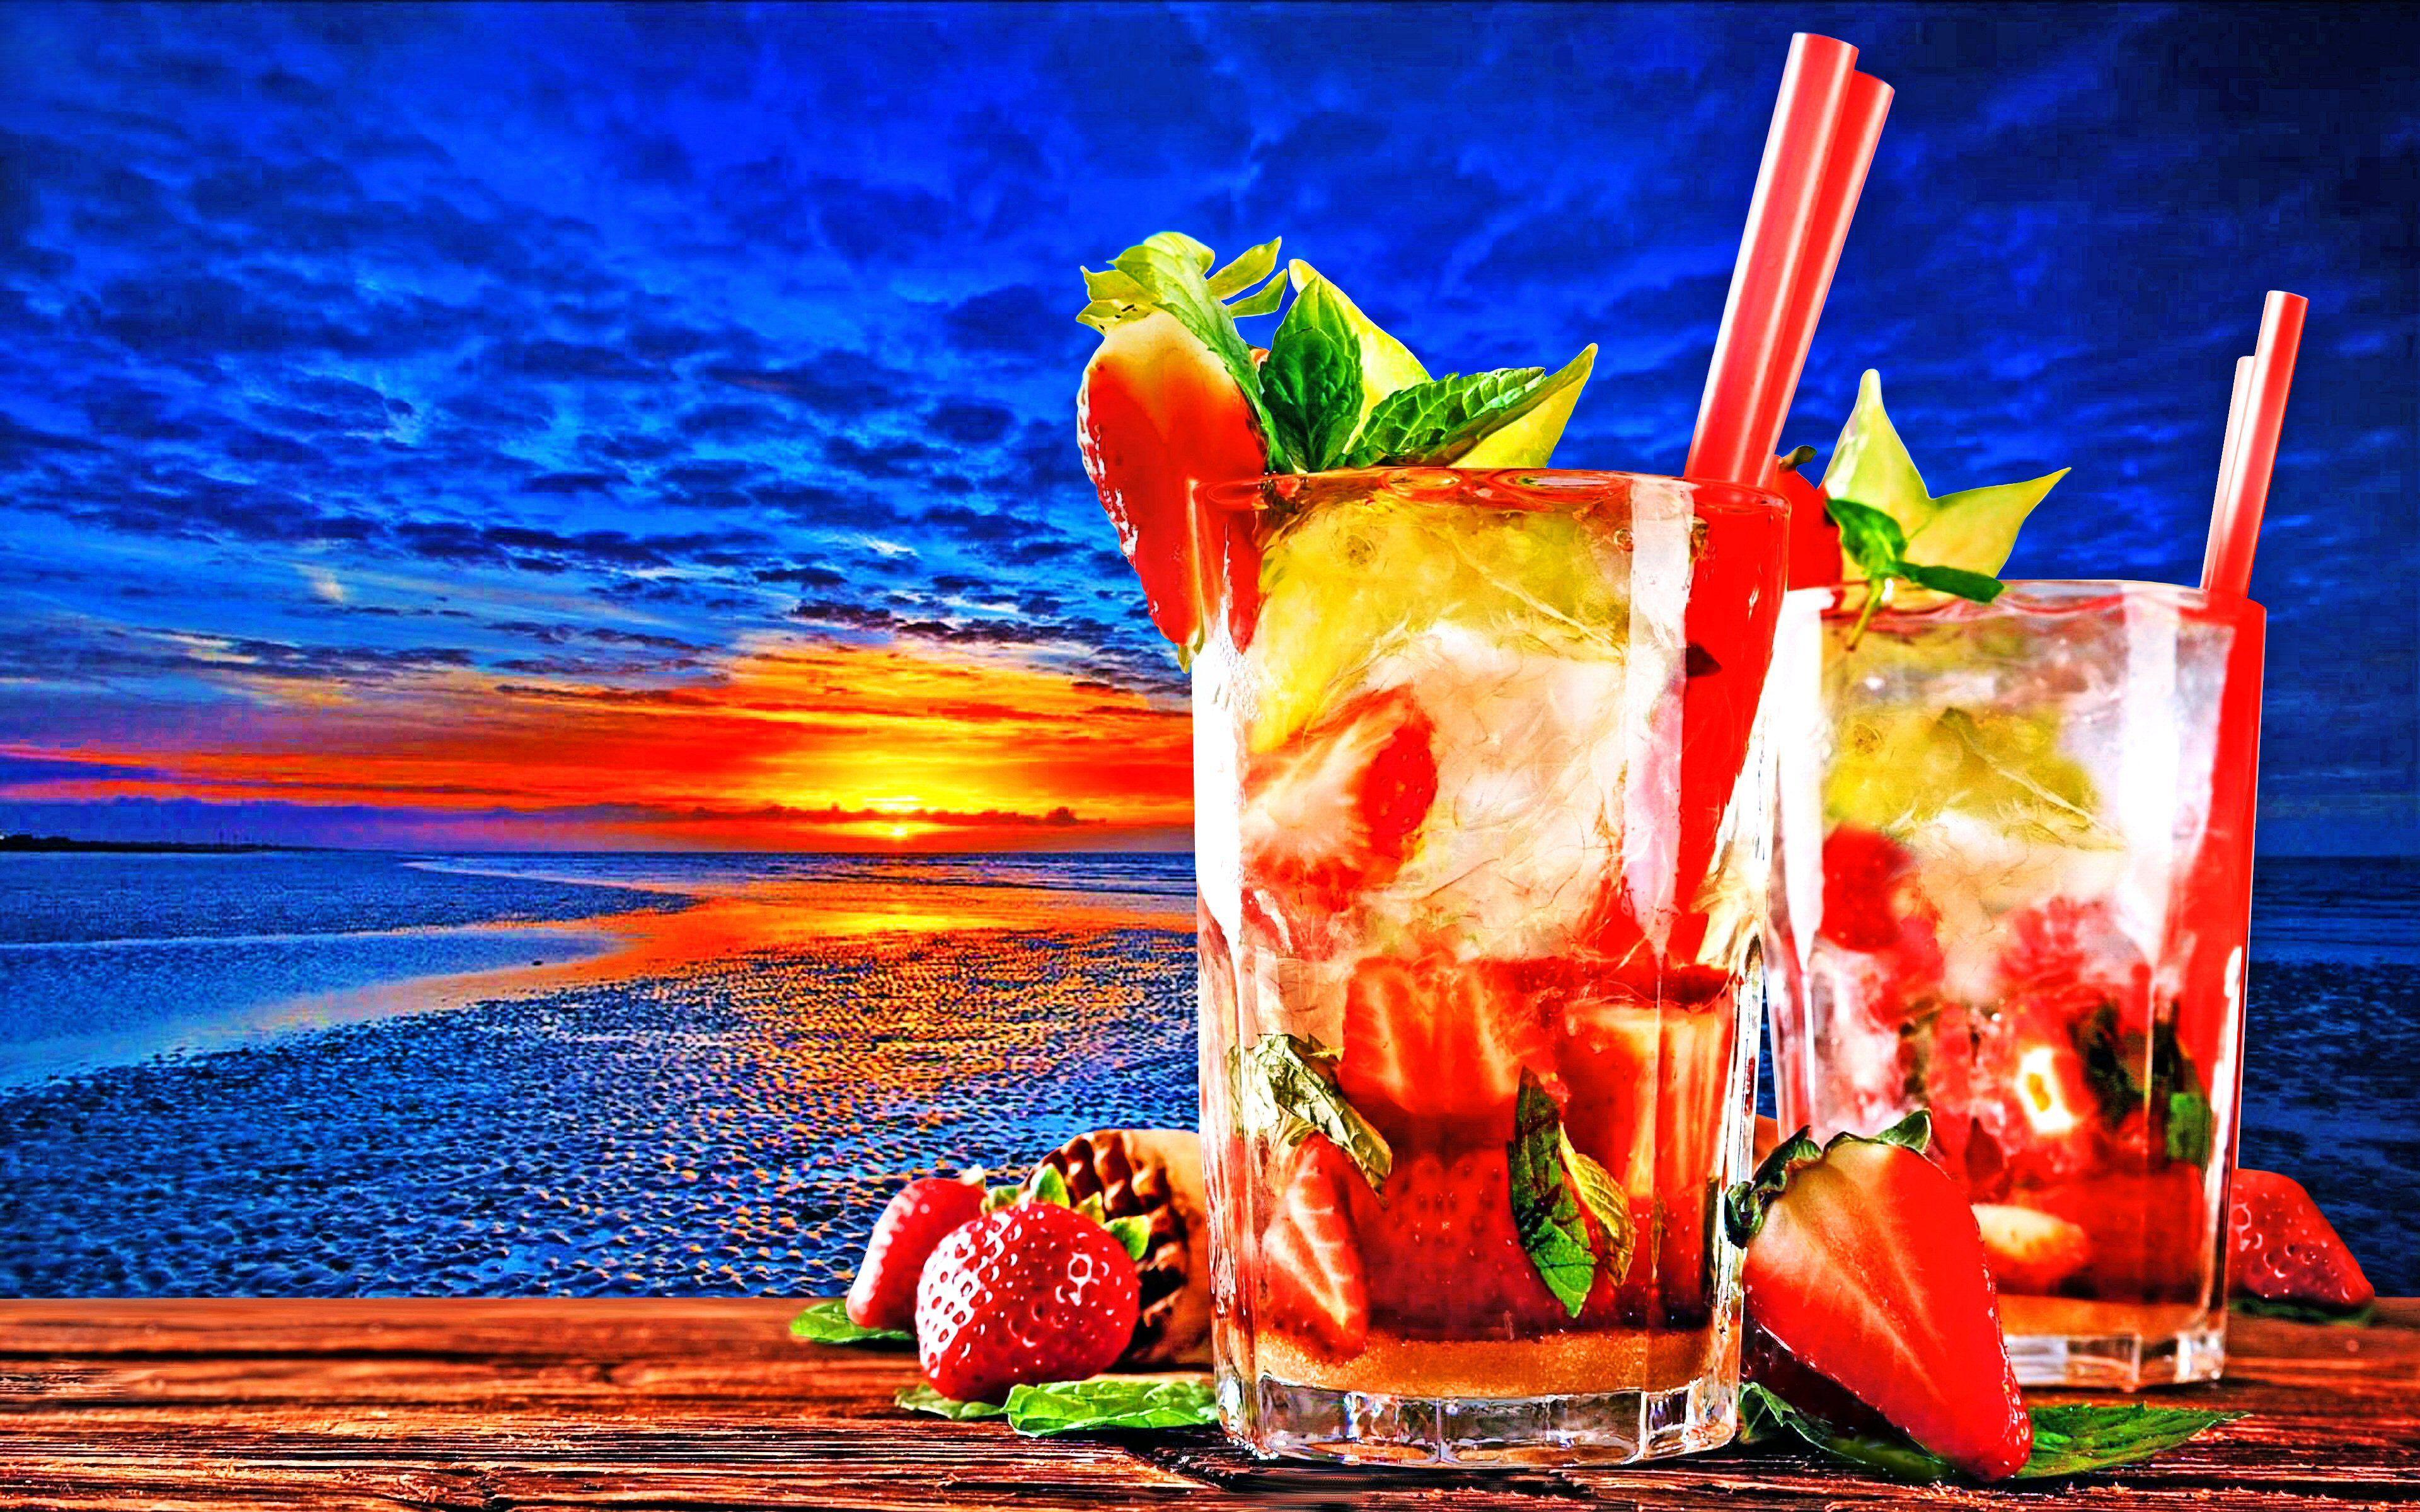 [ALPHA 593888] - COCKTAIL [10] twilight beach [29april2015wednesday] [214036] [VersionOne] HIGHRES [3840x2400] [84729] JPG FINAL 03.jpg